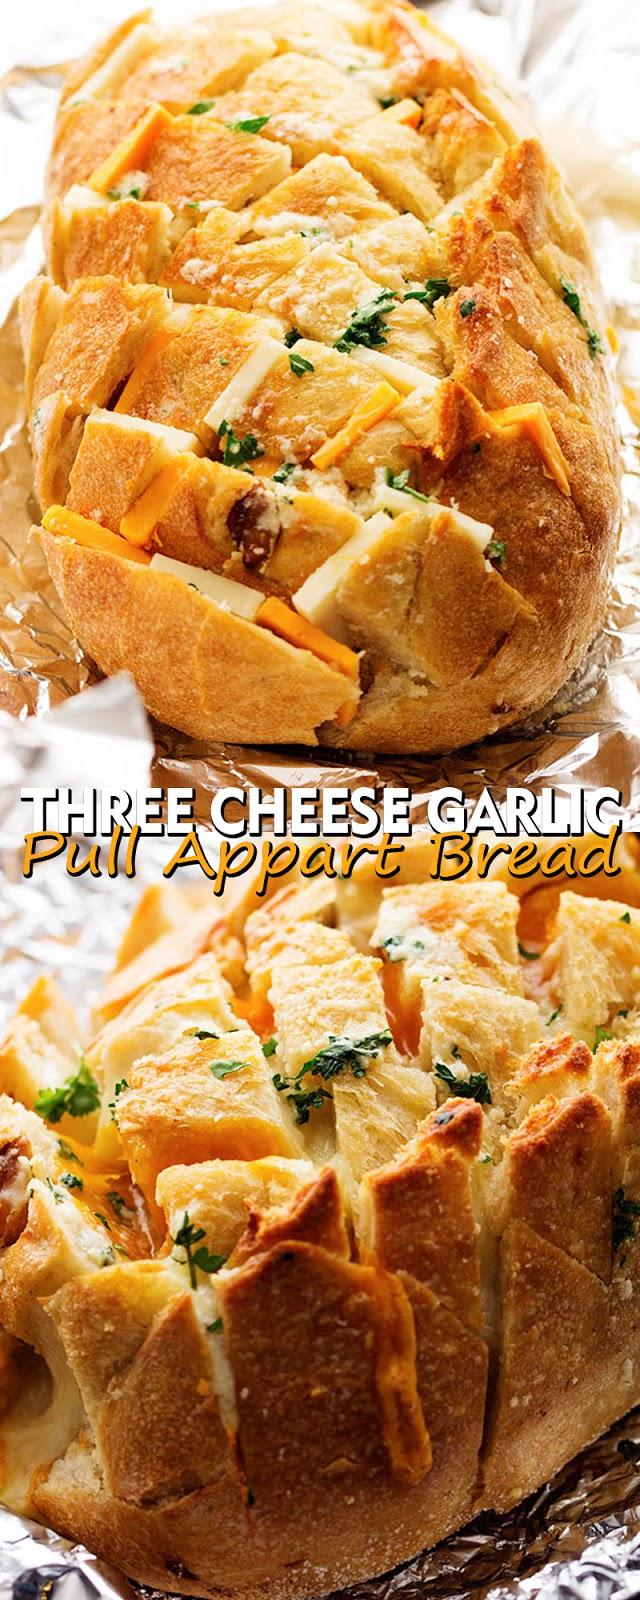 THREE CHEESE GARLIC PULL APART BREAD